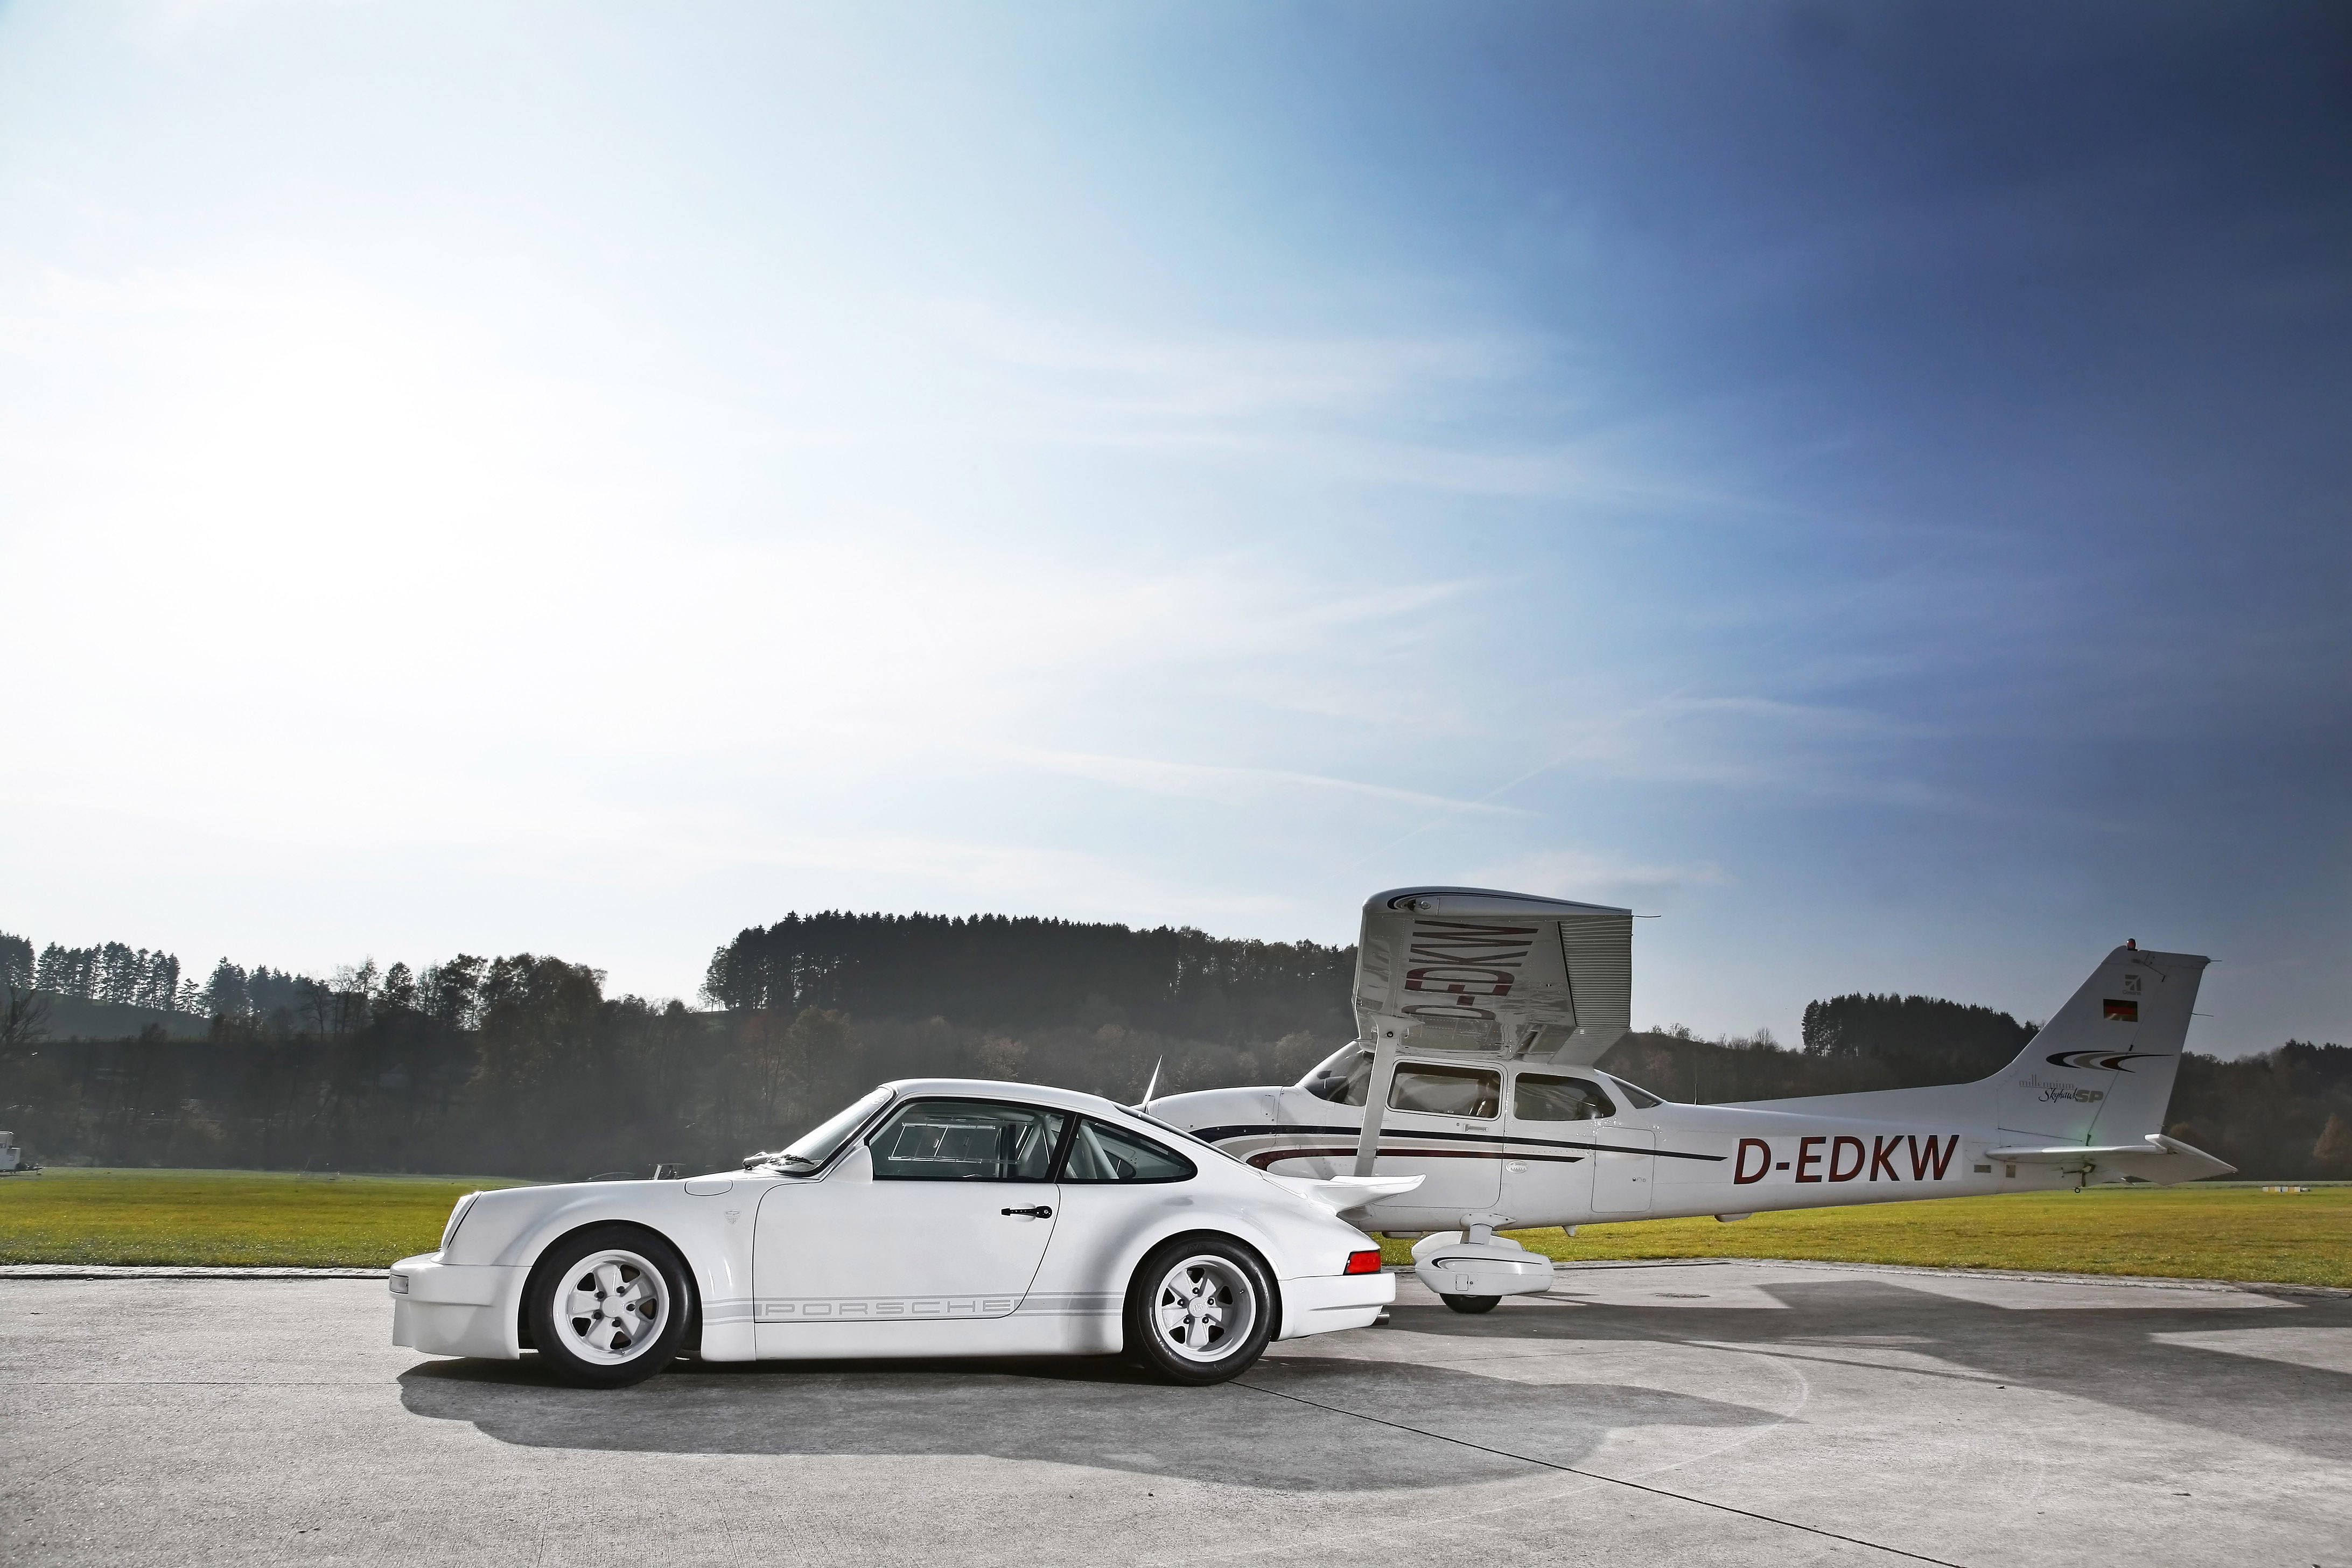 http://www.automobilesreview.com/img/dp-motorsport-1973-porsche-911/dp-motorsport-1973-porsche-911-03.jpg